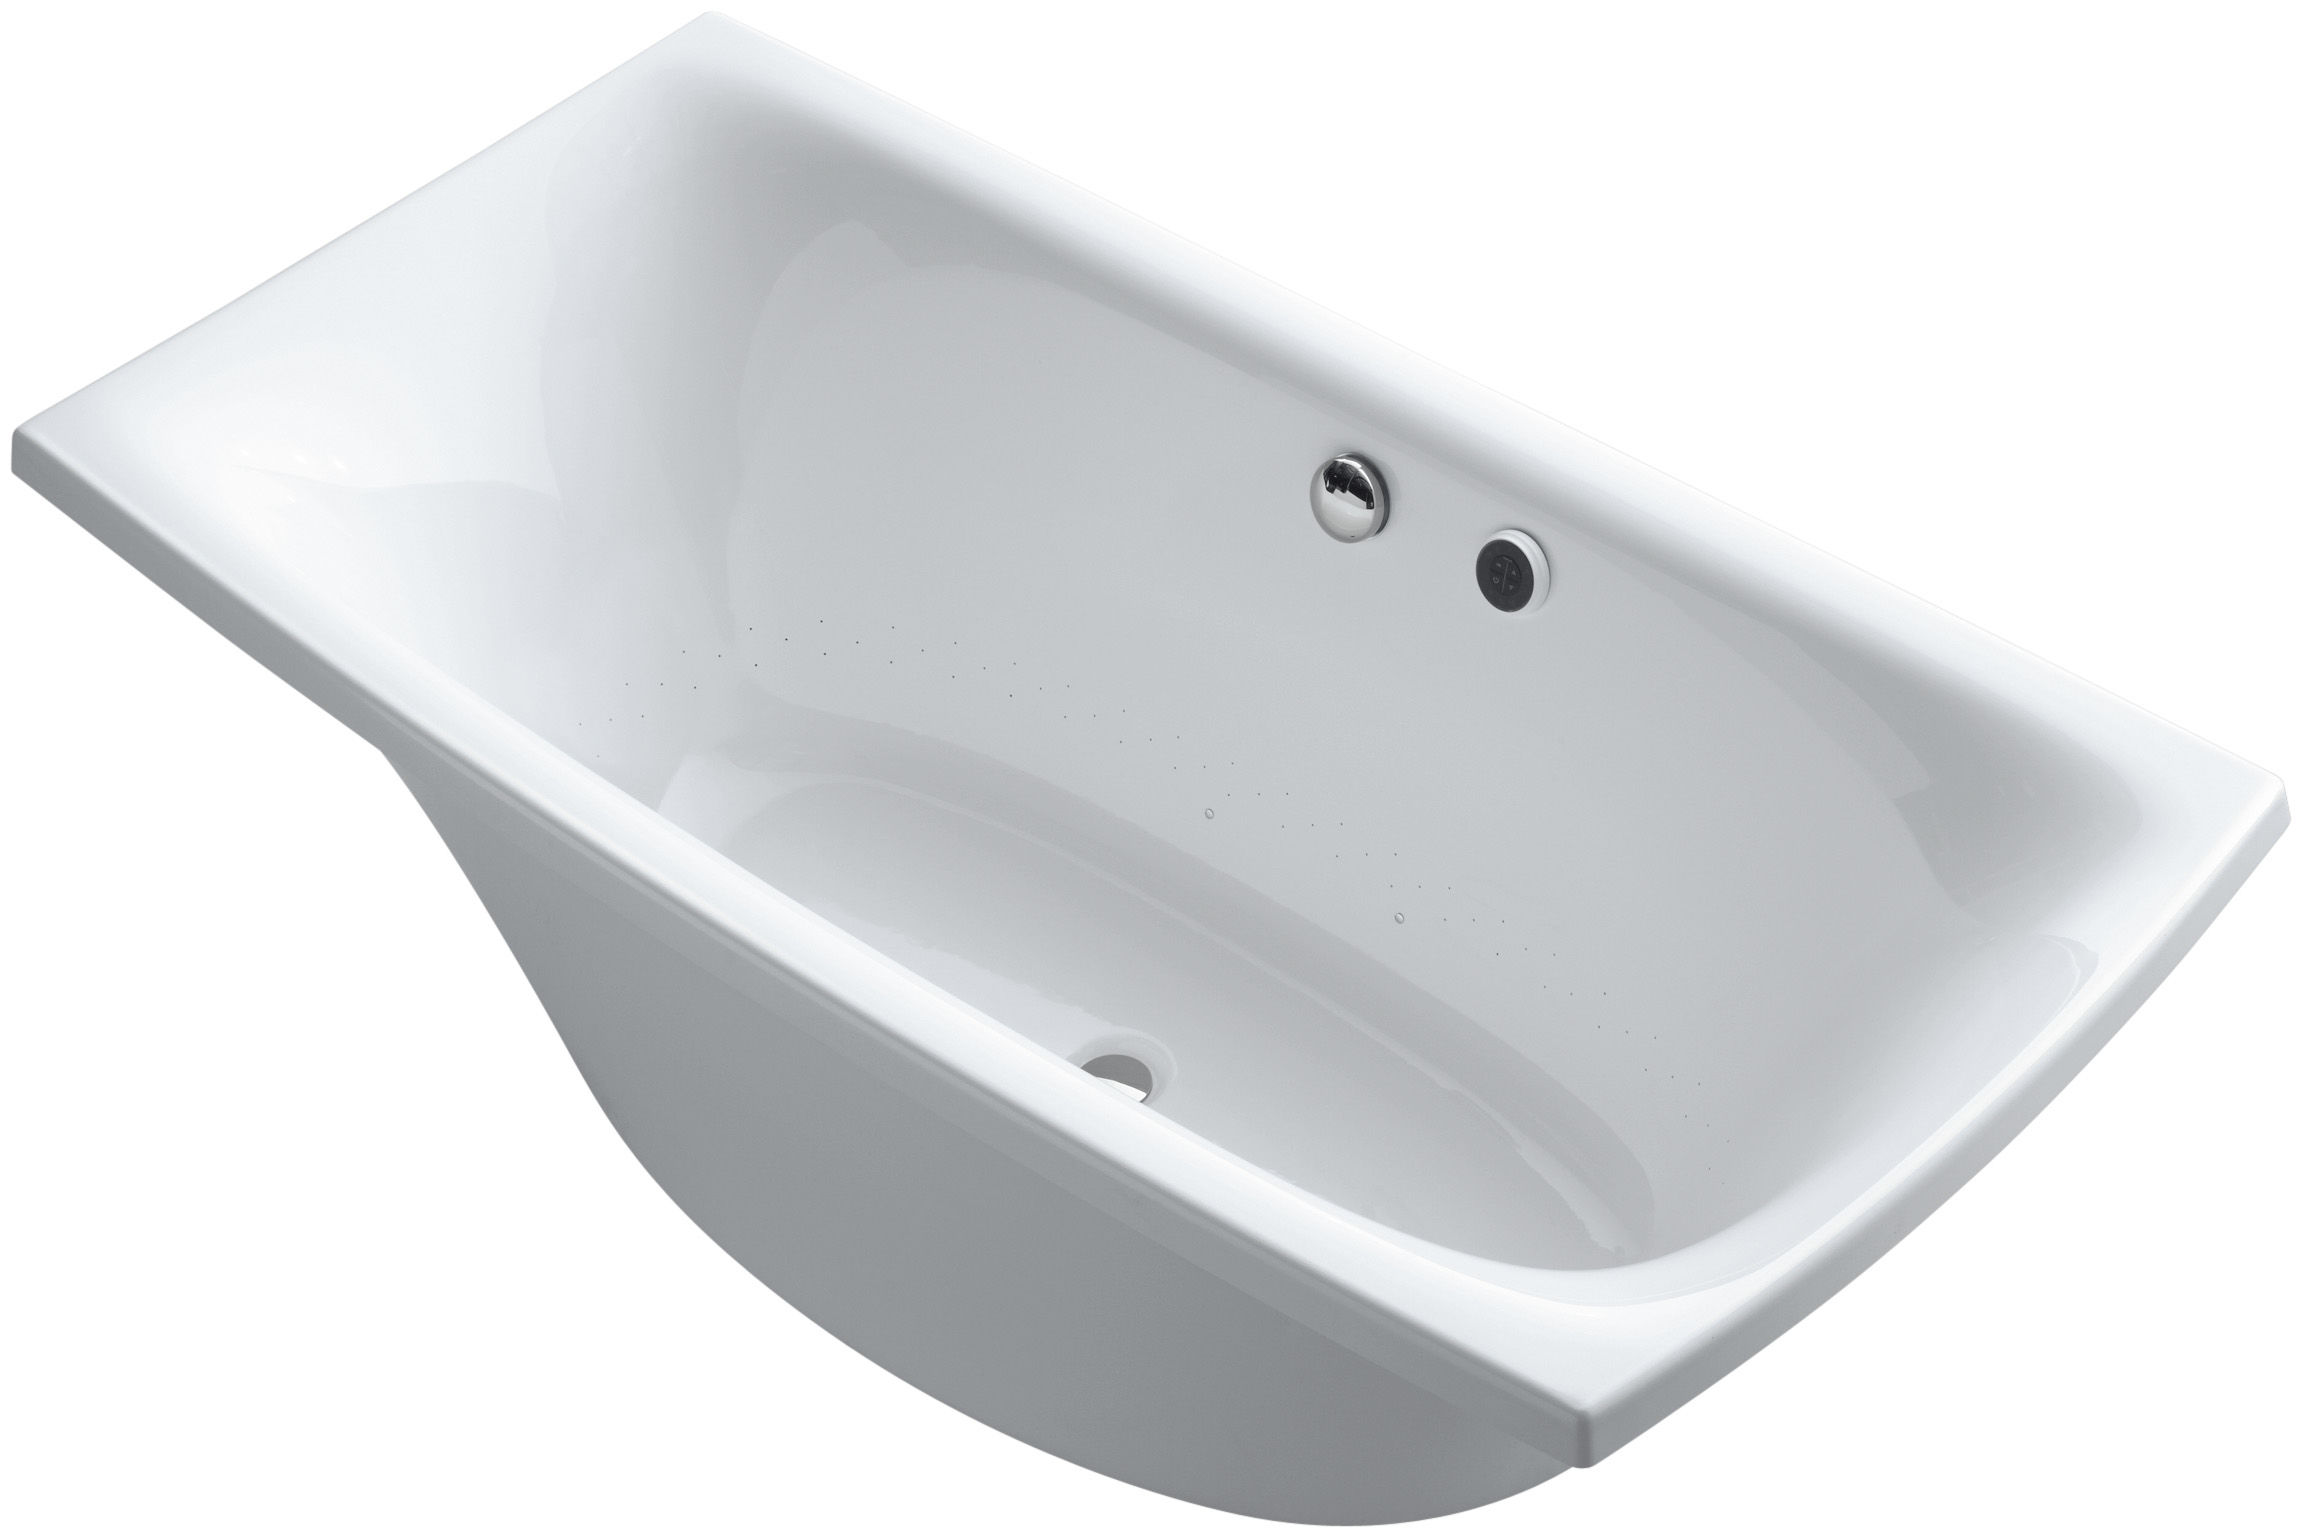 alcove la drain p in bathtub bathtubs kohler whirlpool acrylic k bancroft jacuzzi white rectangular left tub ft